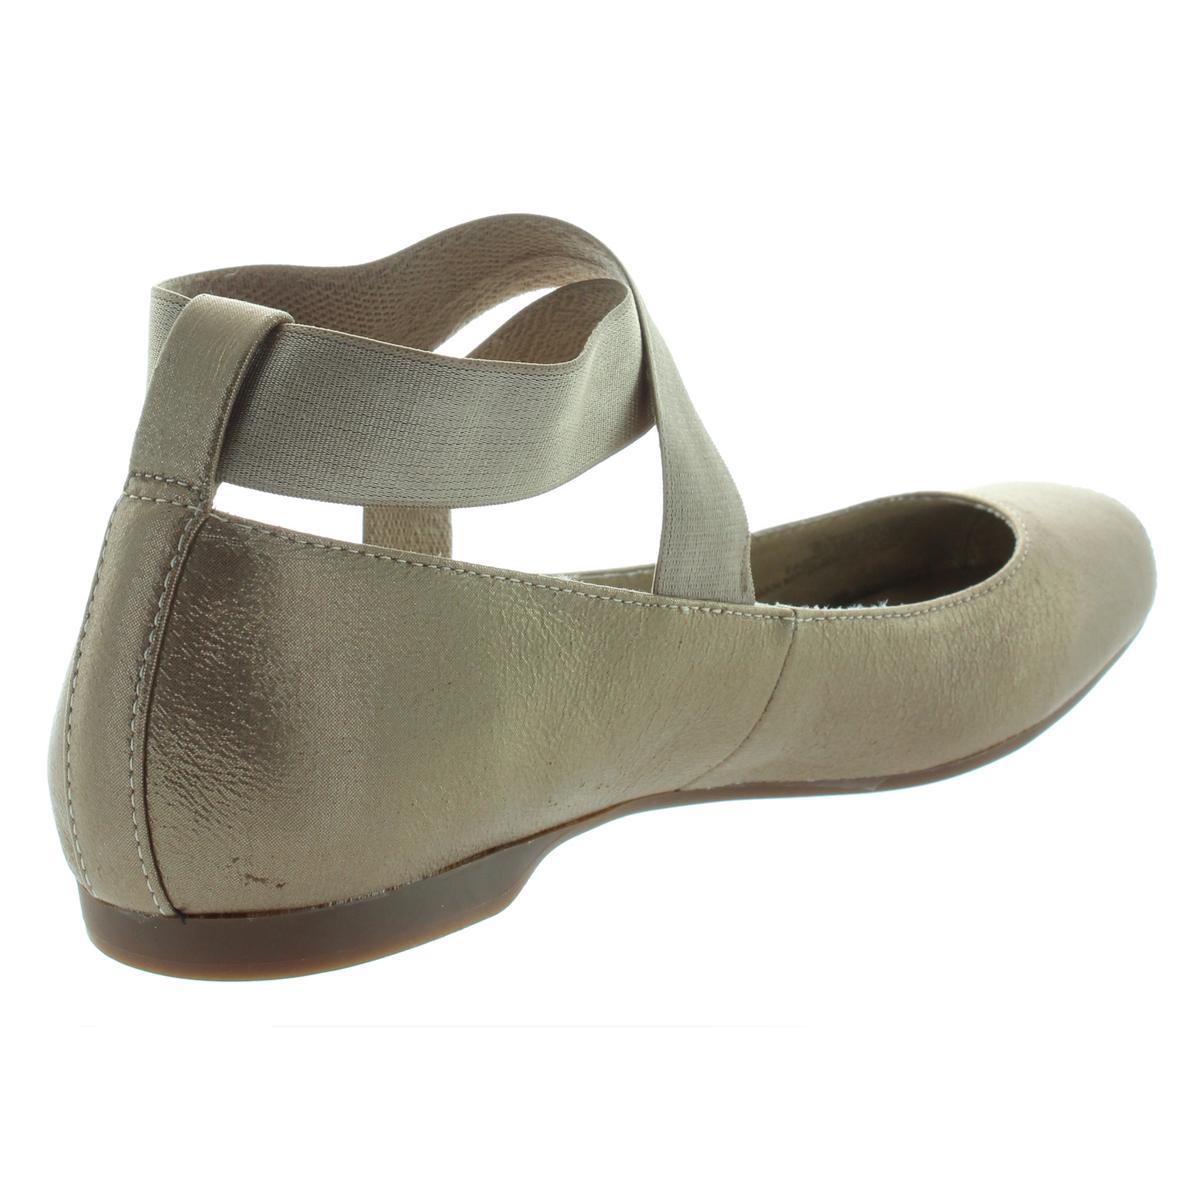 Jessica-Simpson-Women-039-s-Mandalaye-Square-Toe-Ankle-Wrap-Ballet-Flats thumbnail 22